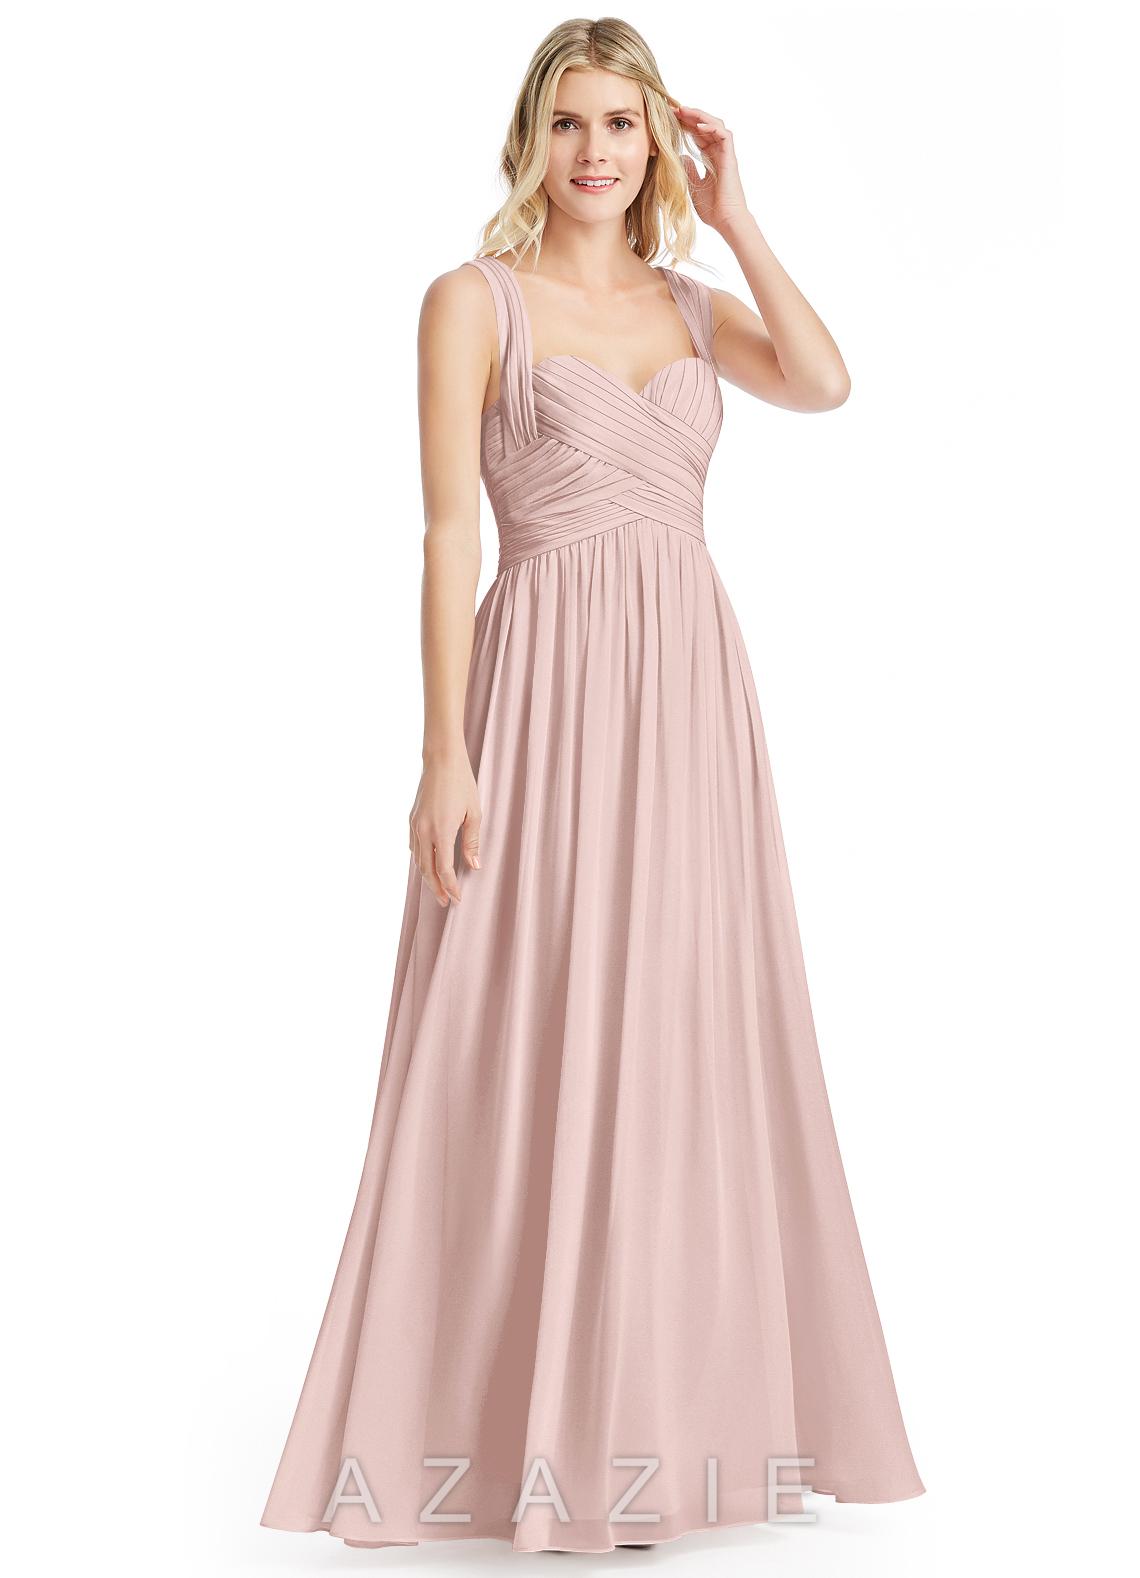 Dusty rose bridesmaid dresses dusty rose gowns azazie azazie cameron azazie cameron ombrellifo Images